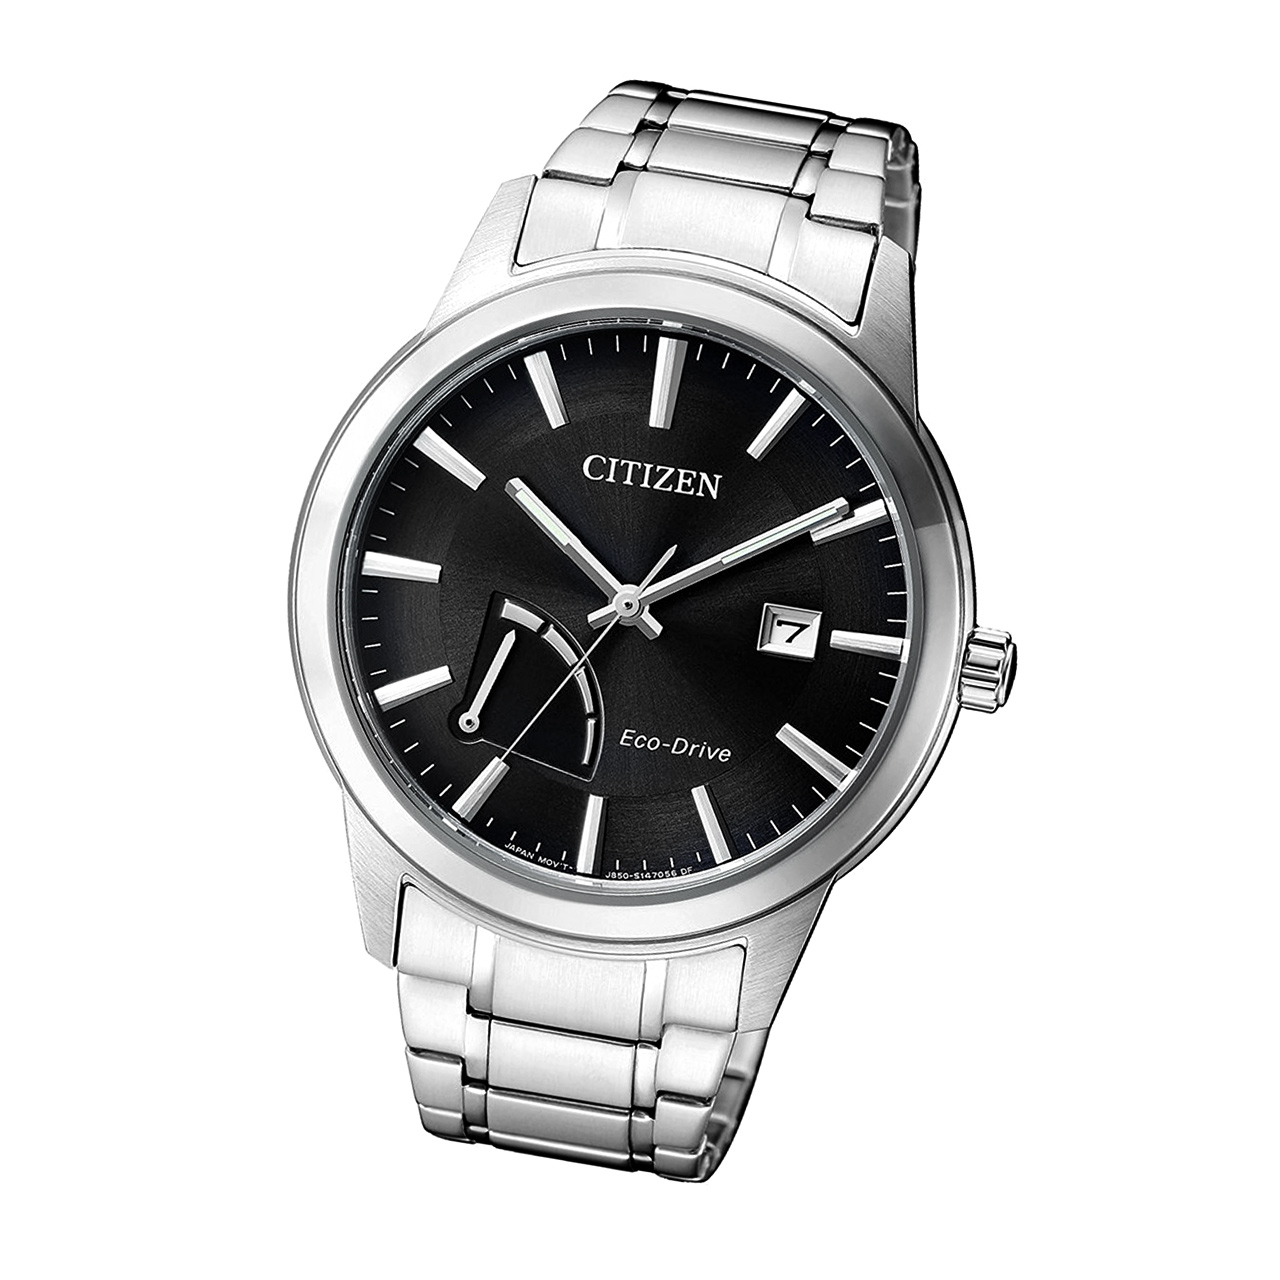 Citizen Elegant AW7010-54E Eco Drive / Solar Herren Armbanduhr